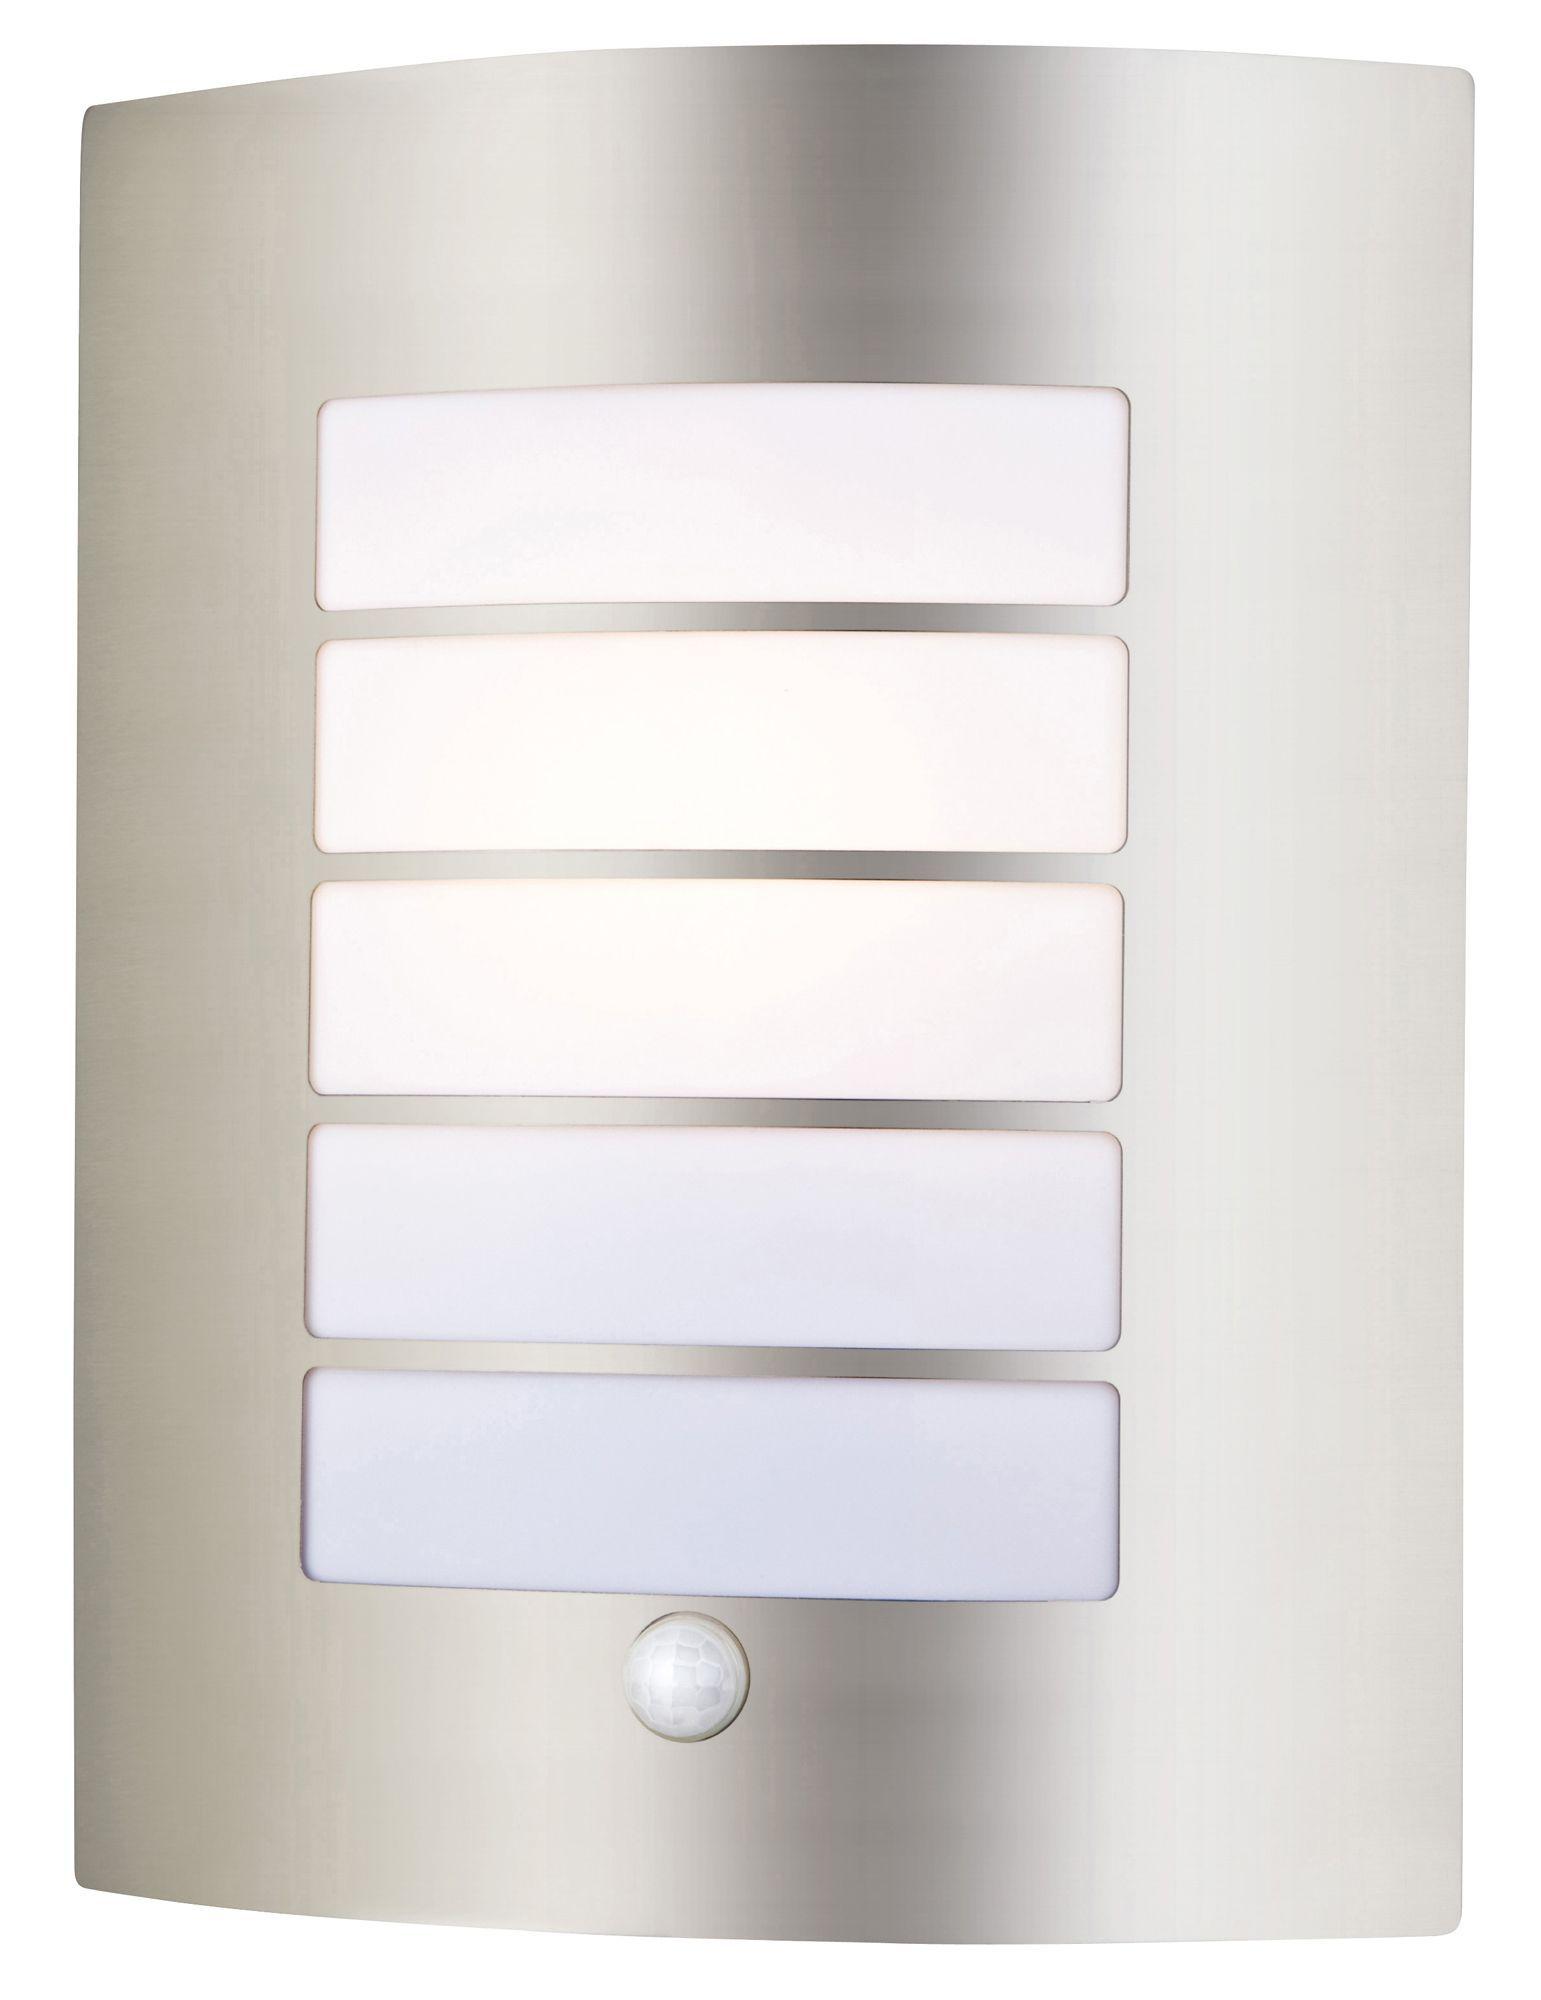 Blooma Tuscana Stainless Steel 40w Mains Powered External Pir Wall Light